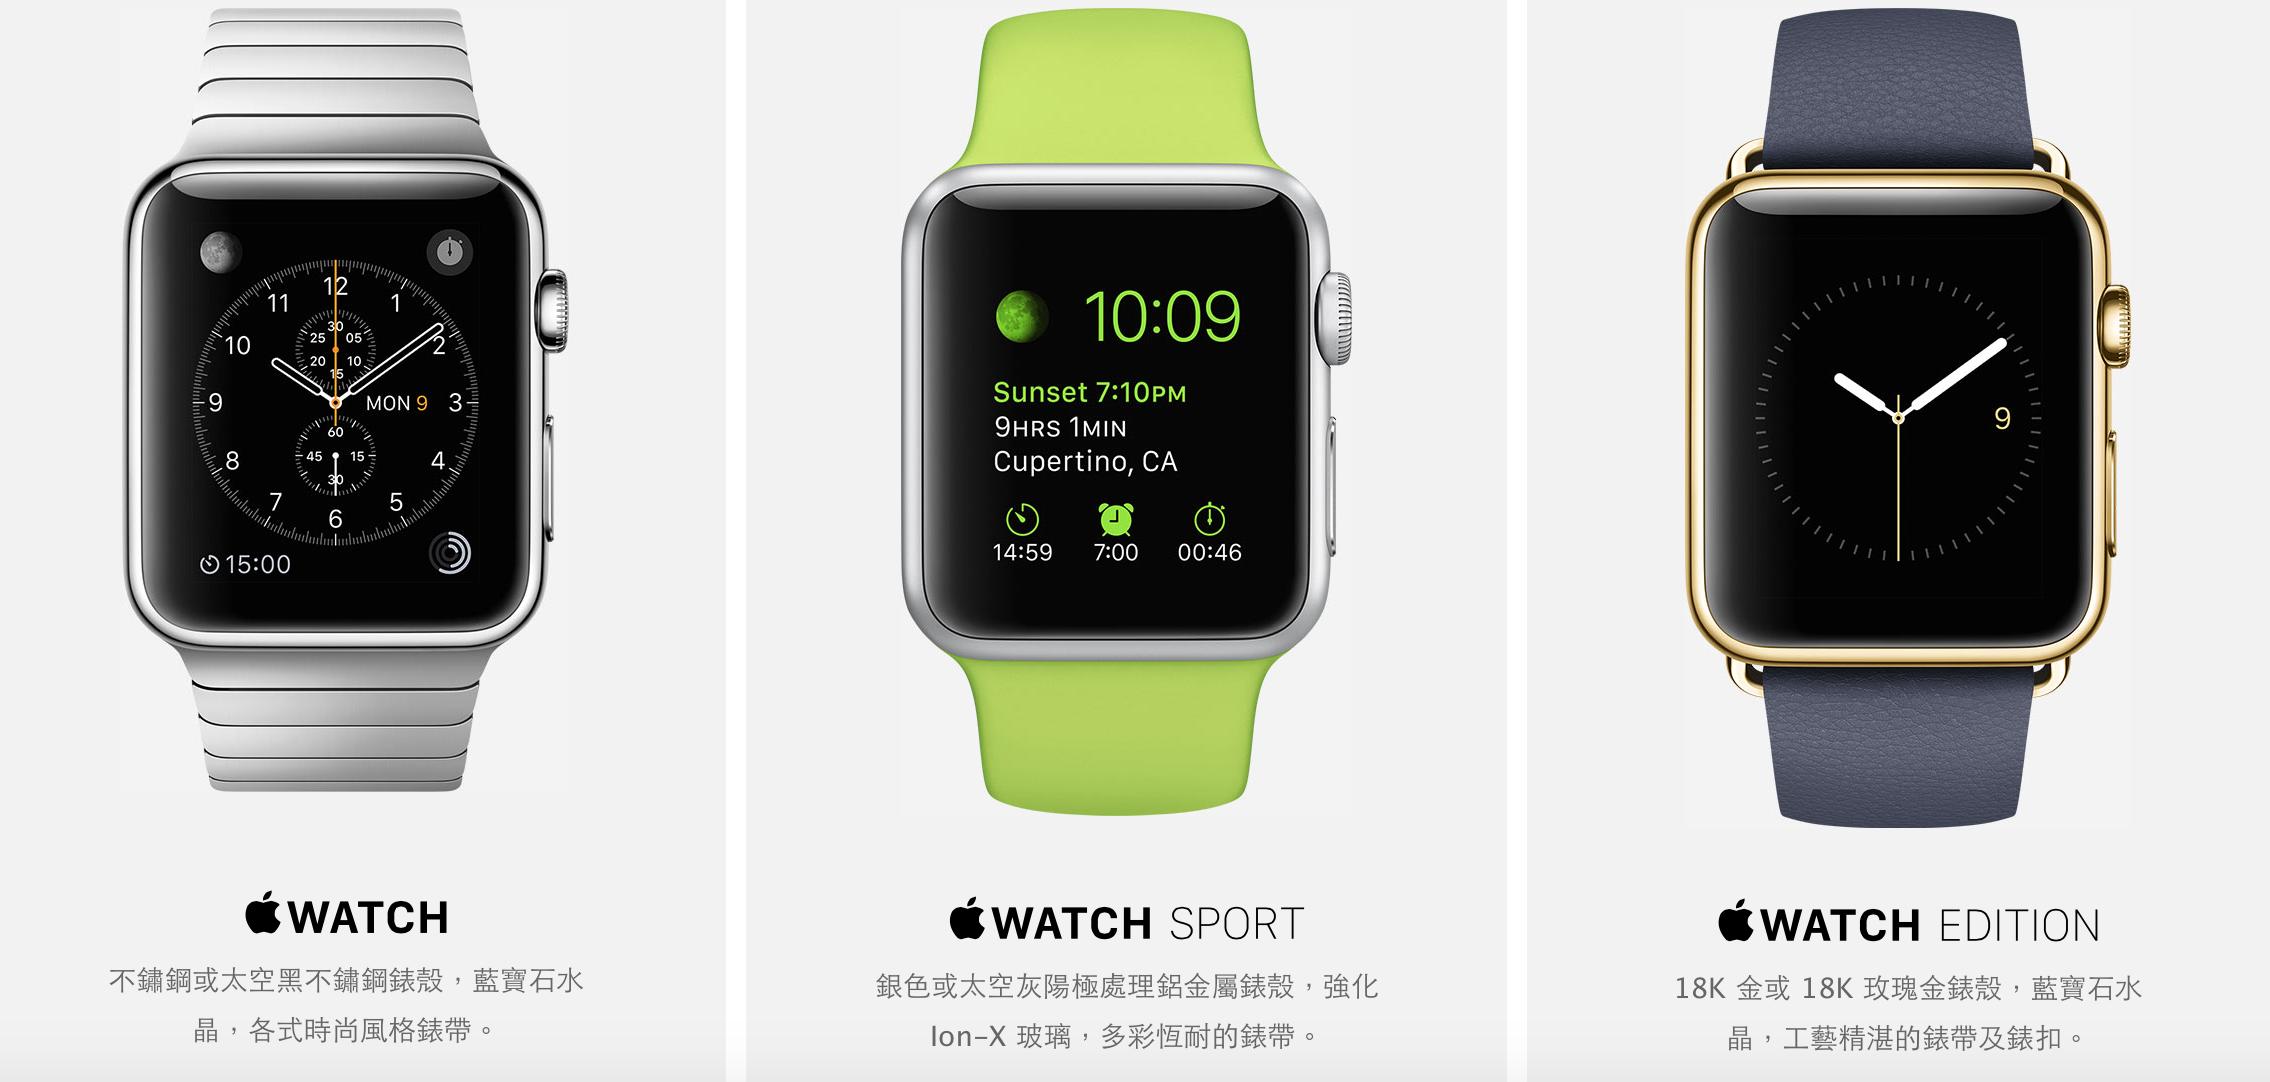 Apple Watch的三種錶身版本。(蘋果官網)